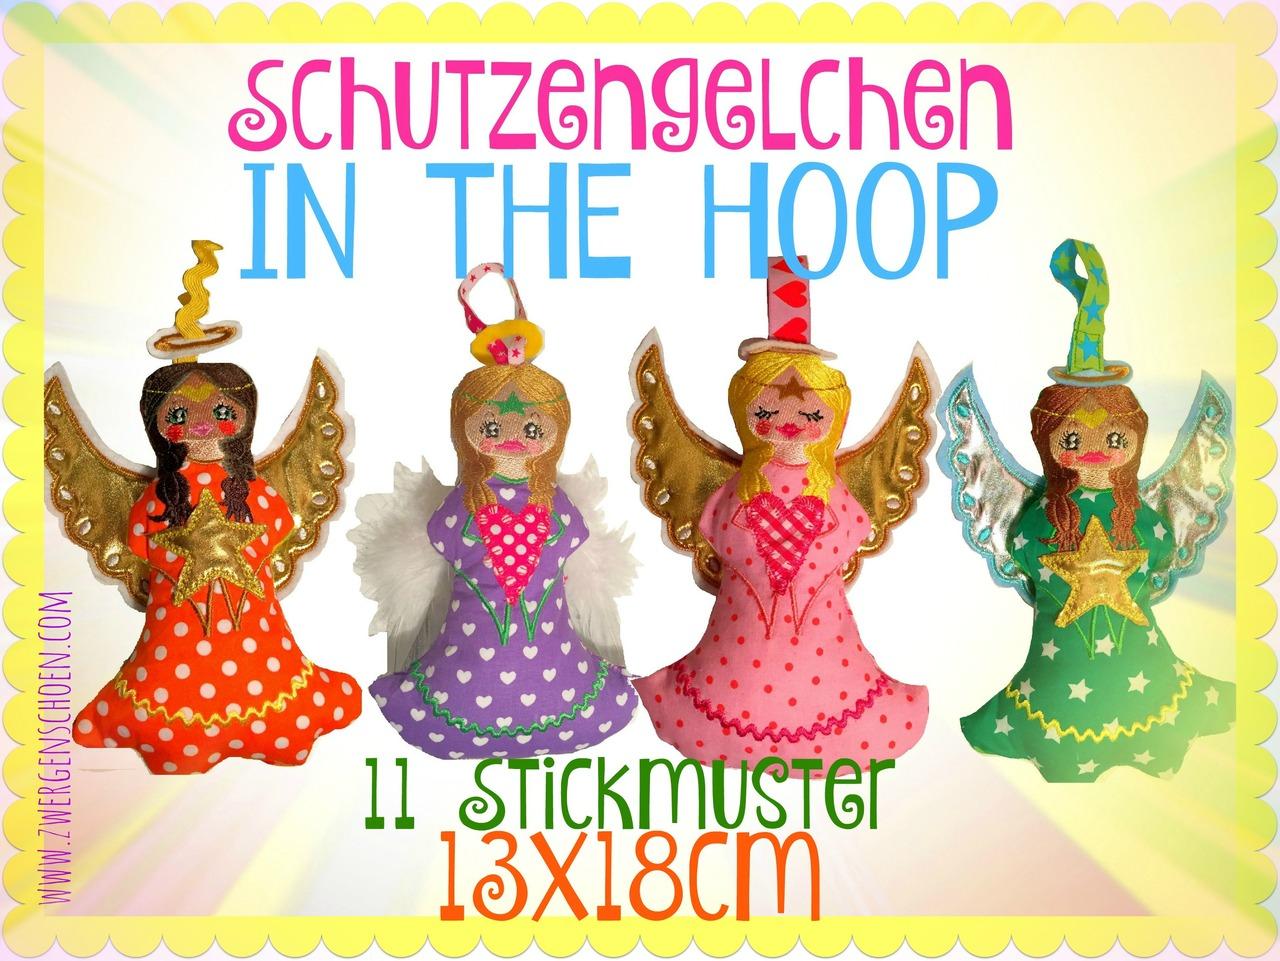 ♥SCHUTZengelchen♥ITH Stickmuster 13x18cm      IN THE HOOP